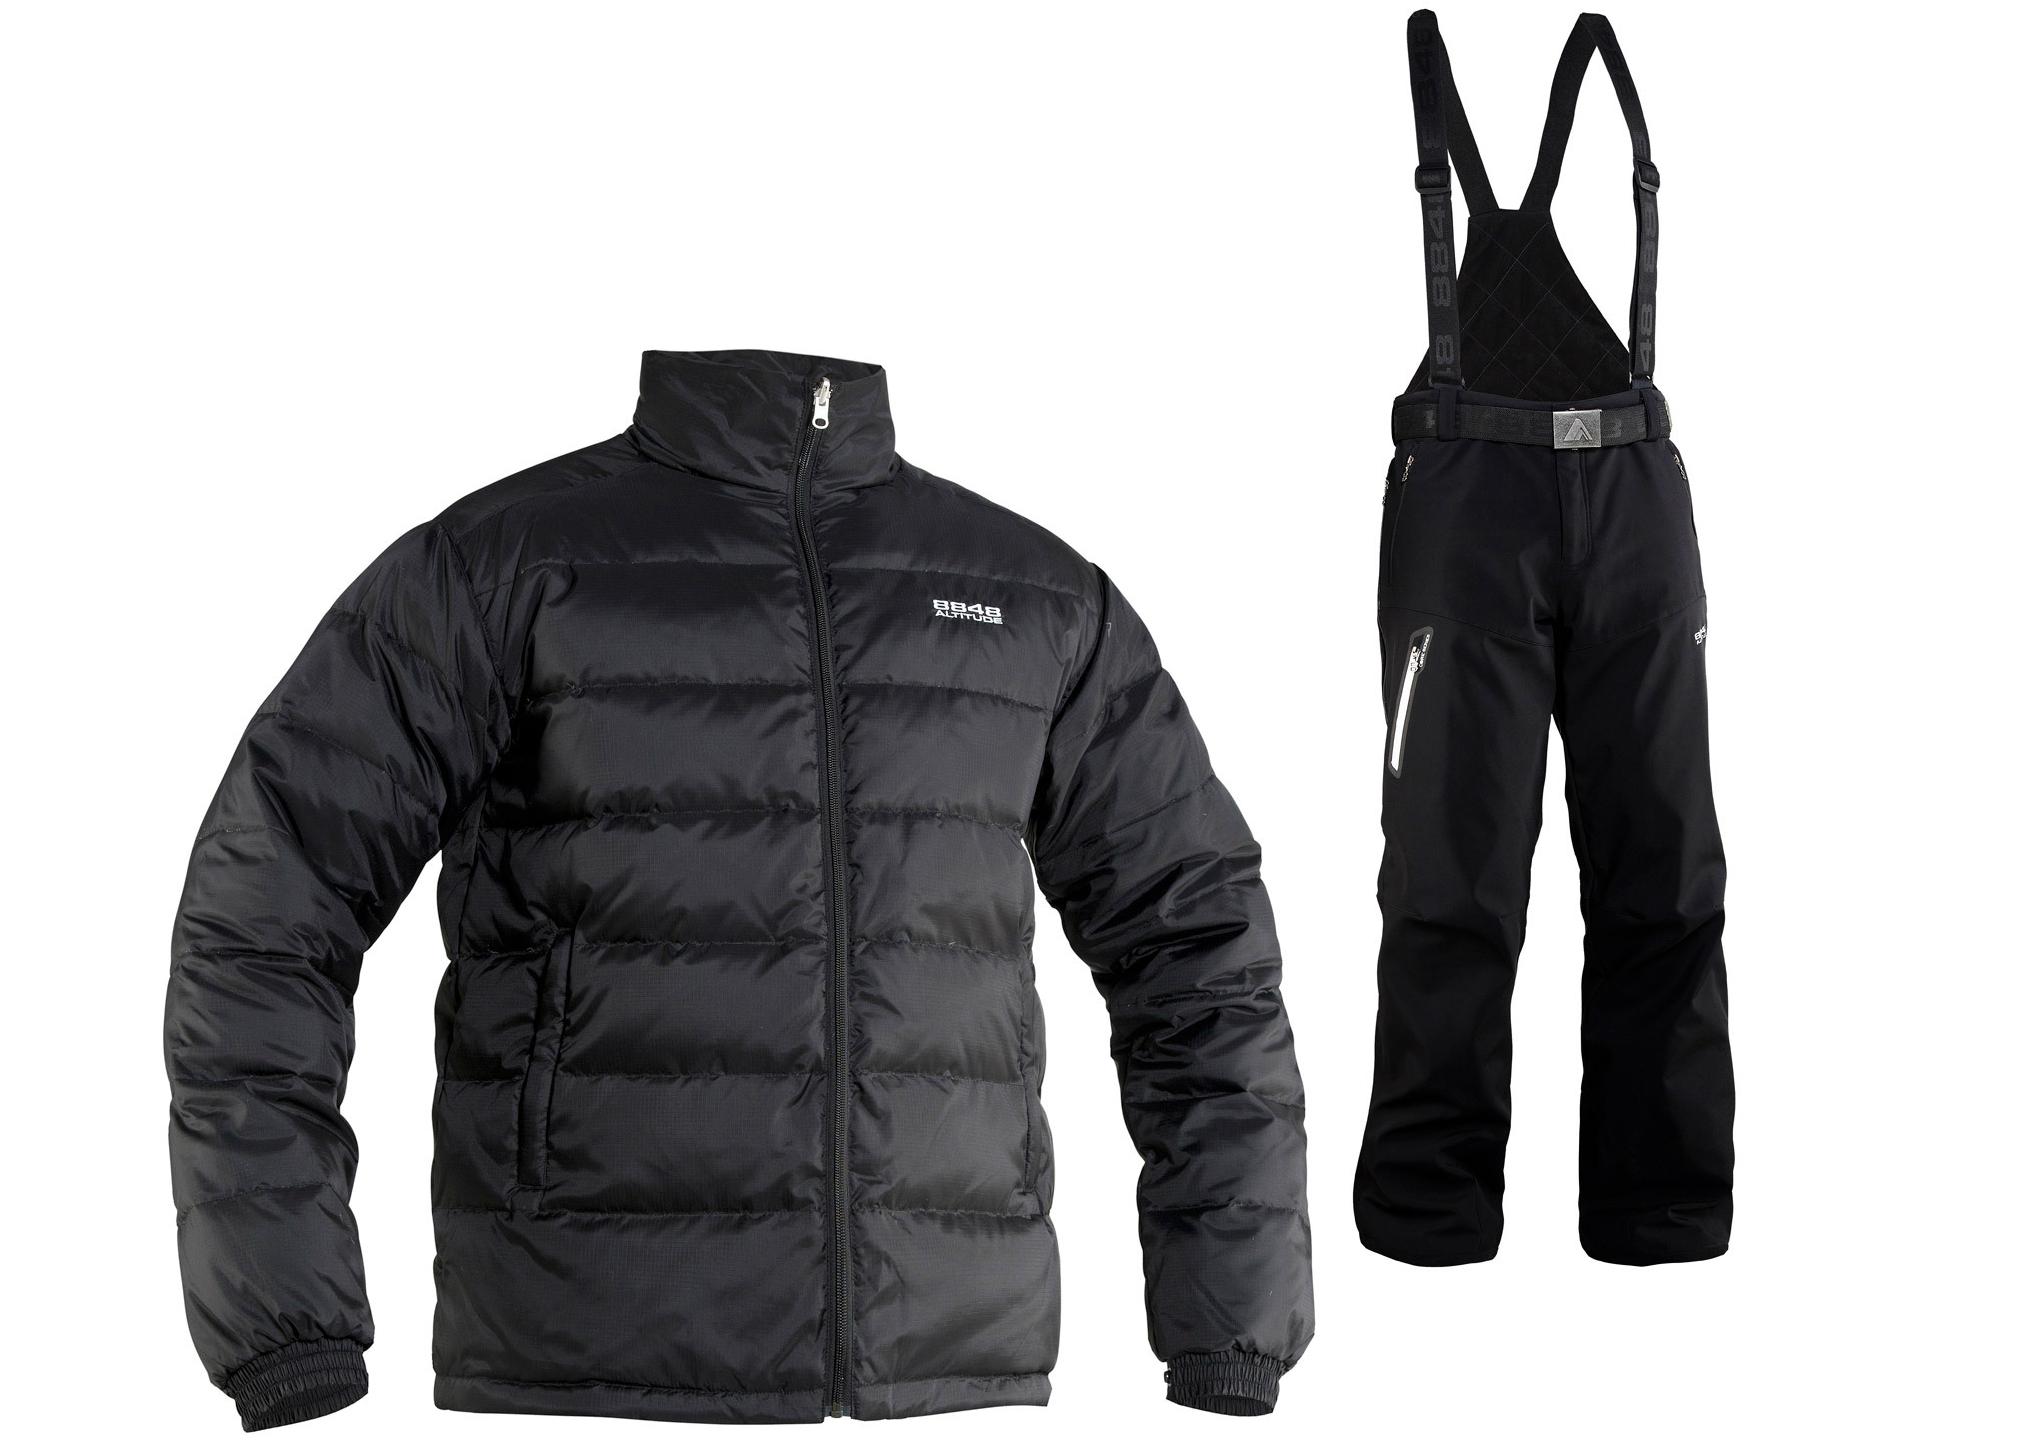 Зимний костюм 8848 Altitude парка Bruson/Kers мужской White